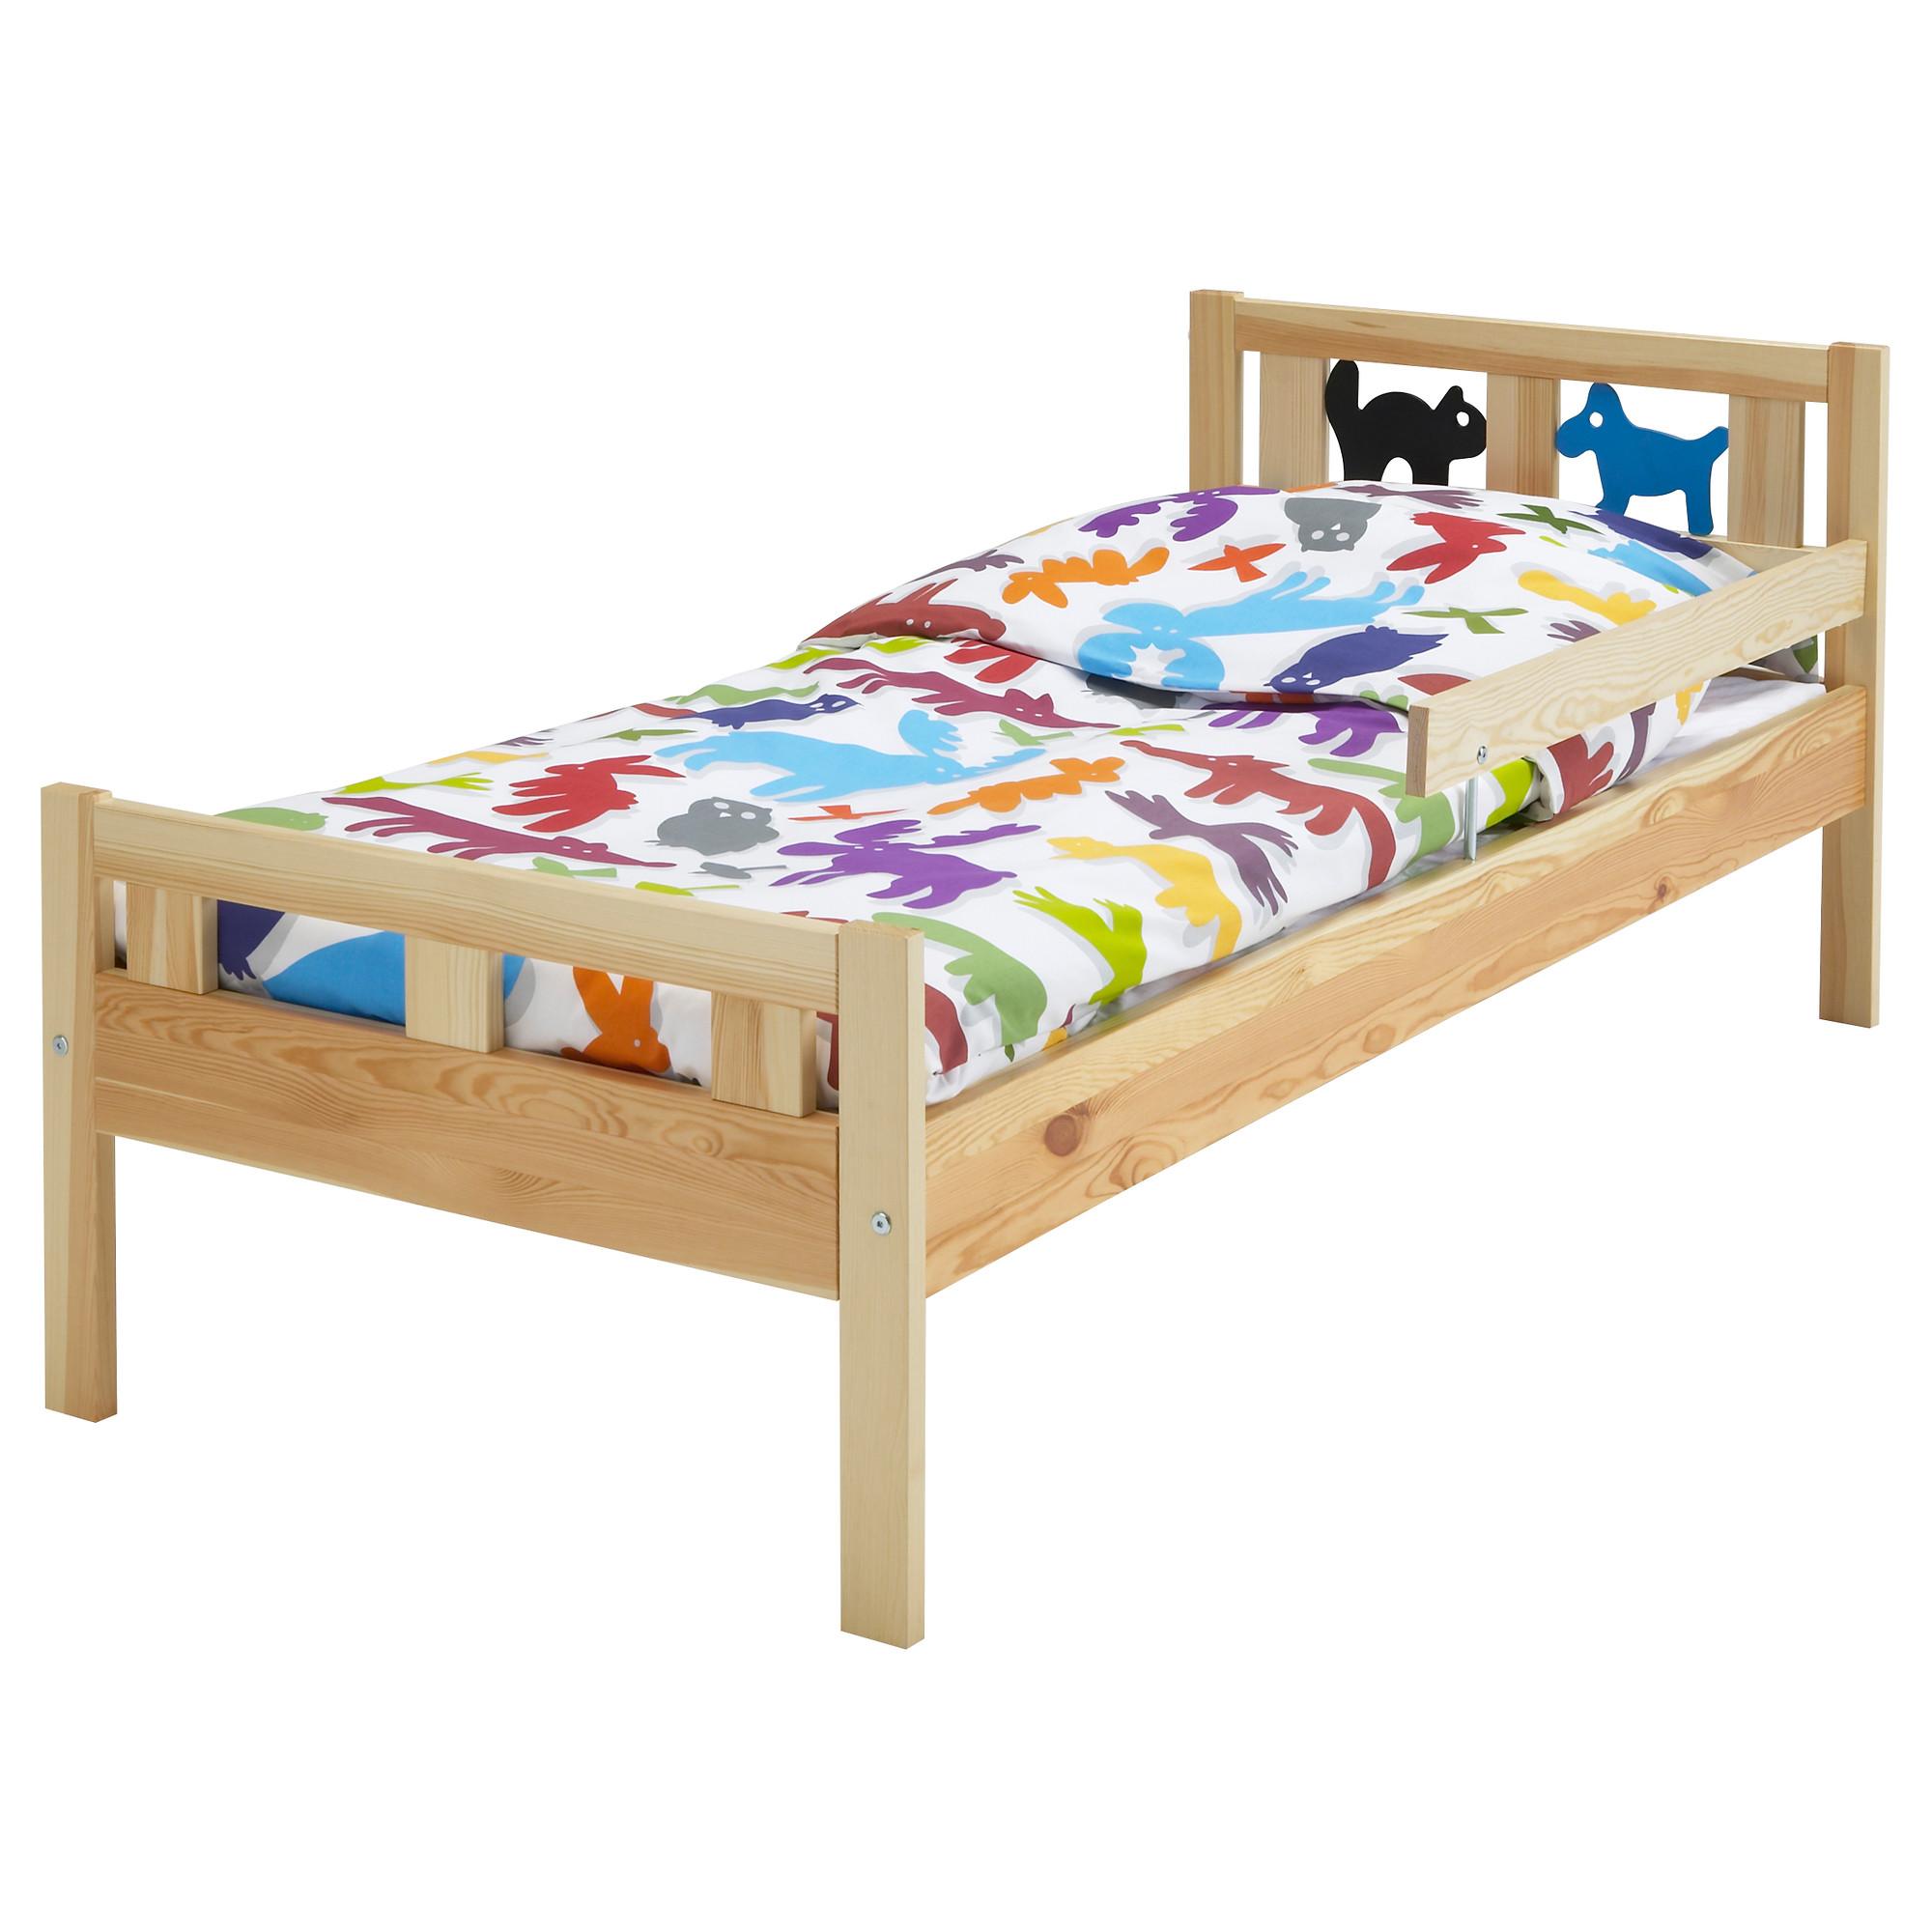 childrens bed comfortable childrenu0027s bed JYMGGMW